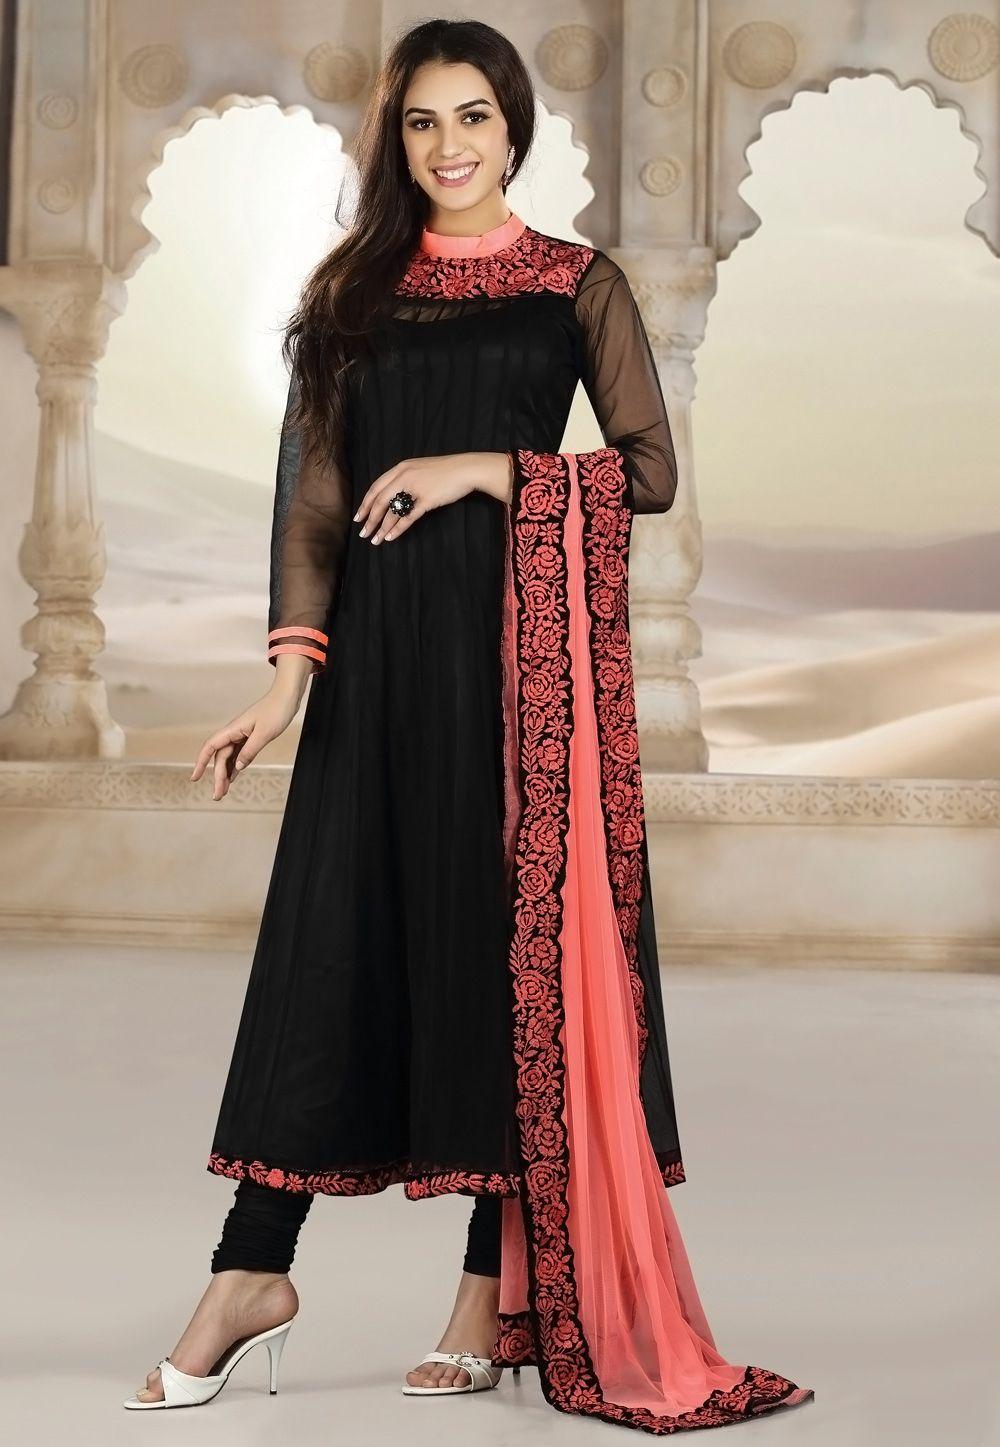 Designer salwar kameez mesmeric peach color net designer suit - Black Peach Faux Georgette Churidar Kameez With Contrast Dupatta Try This Combo With